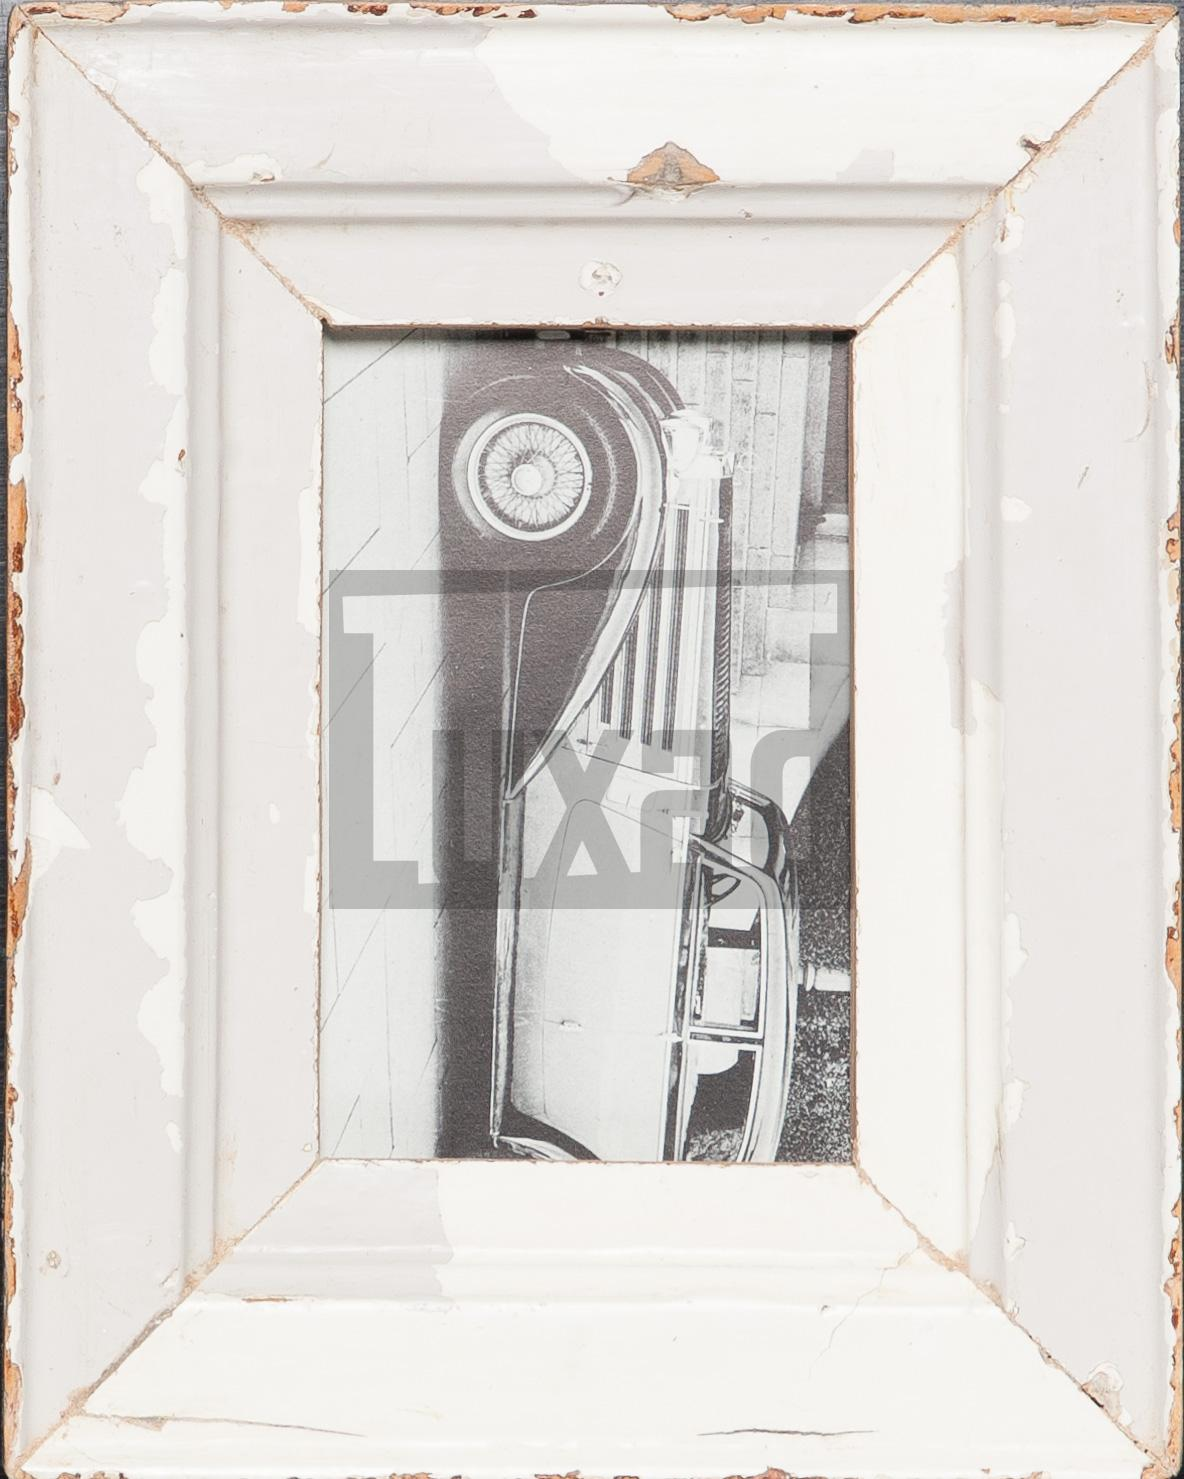 Holzbilderrahmen für Fotos 10 x 15 cm